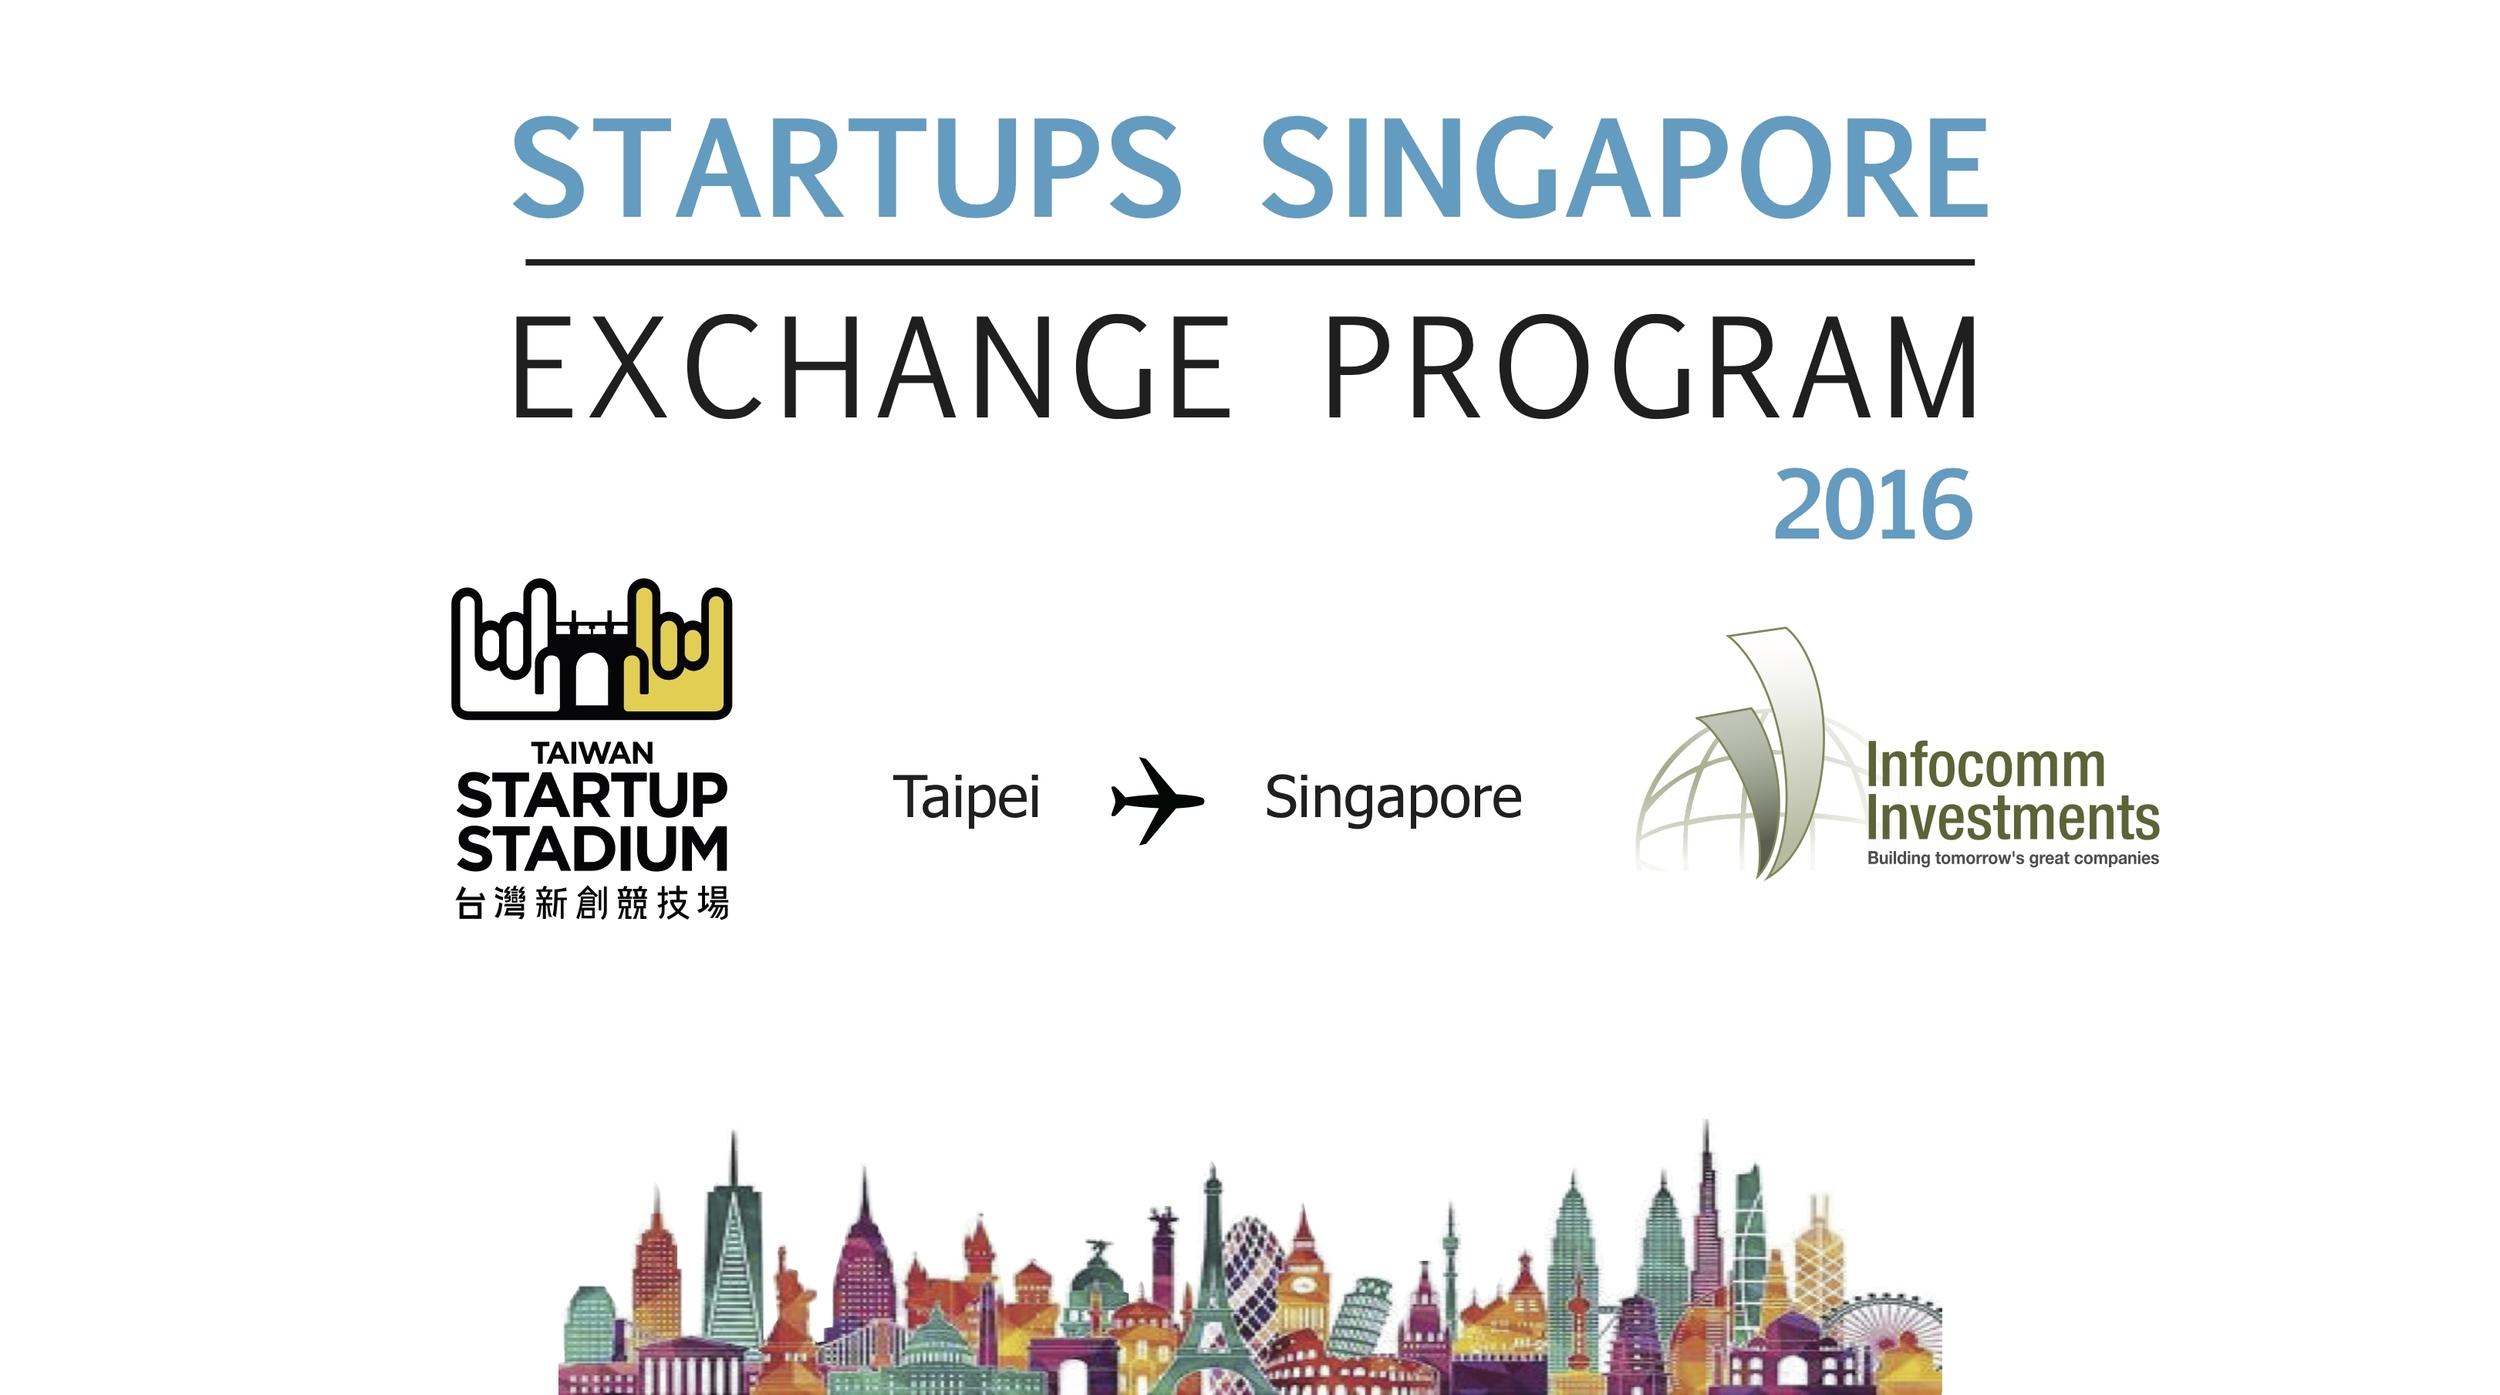 taiwan-startup-stadium-infocomm-investments-exchange-program-2016.jpg